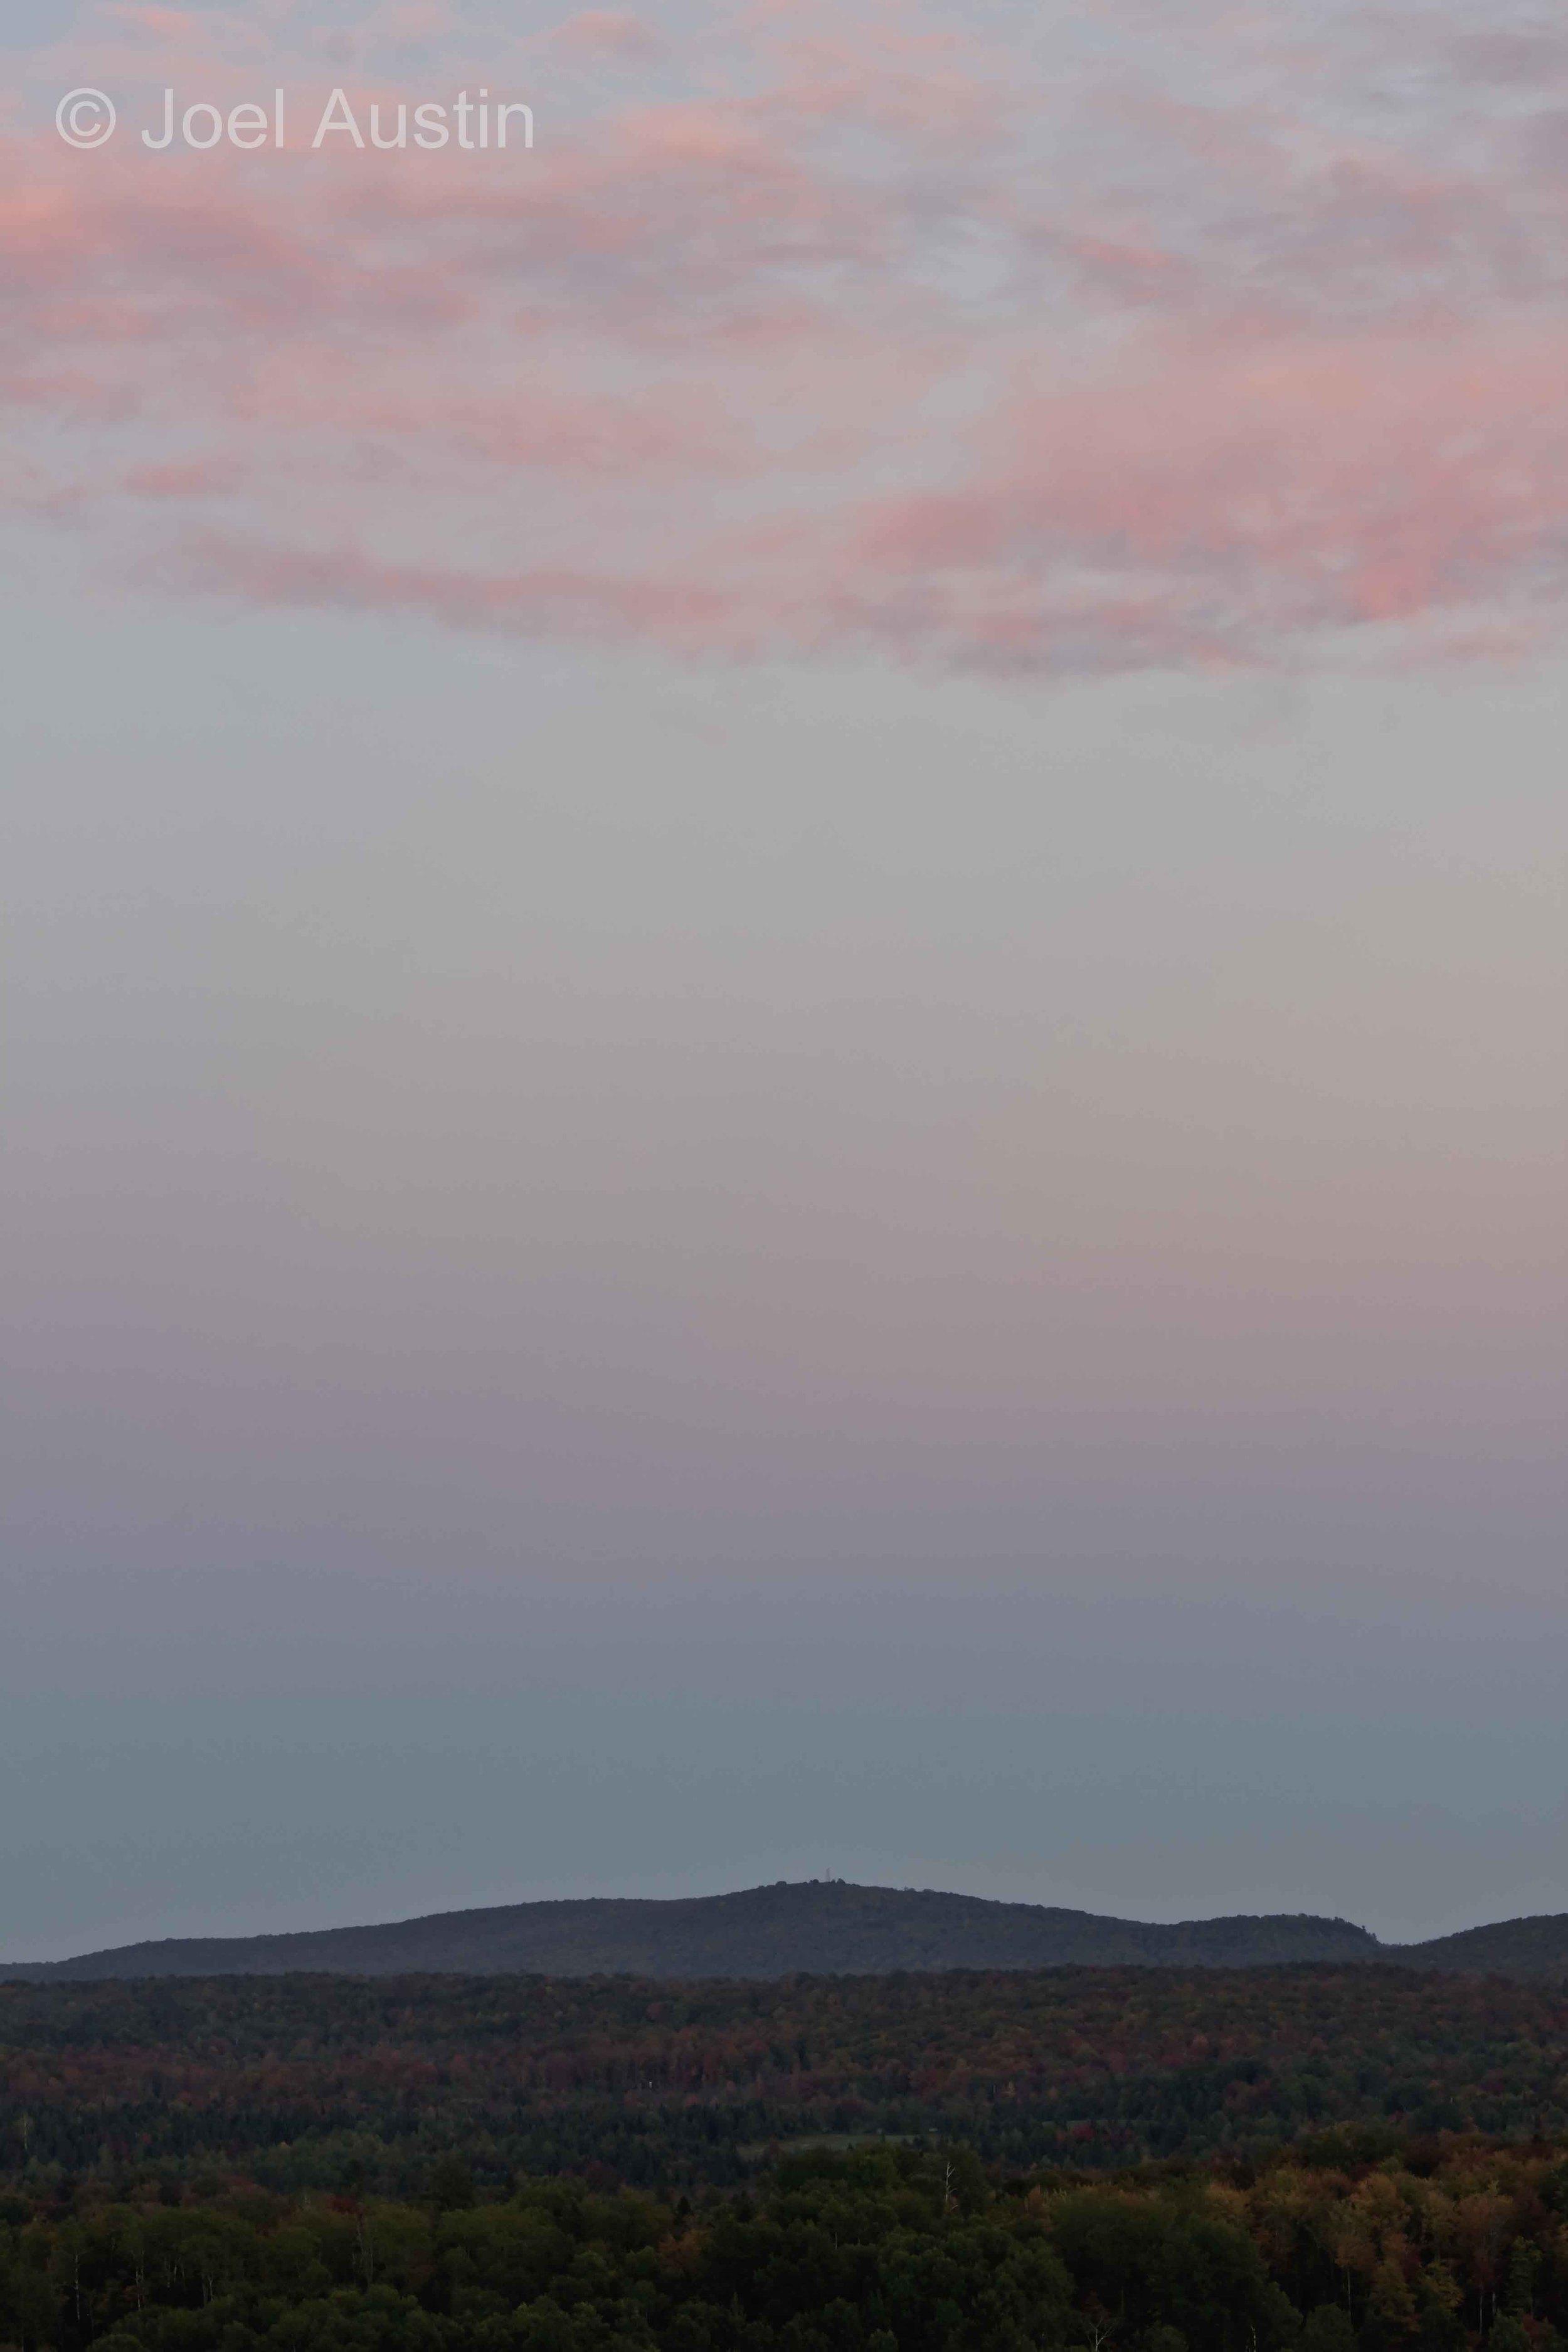 Quiet sunset from Voigt's Knob